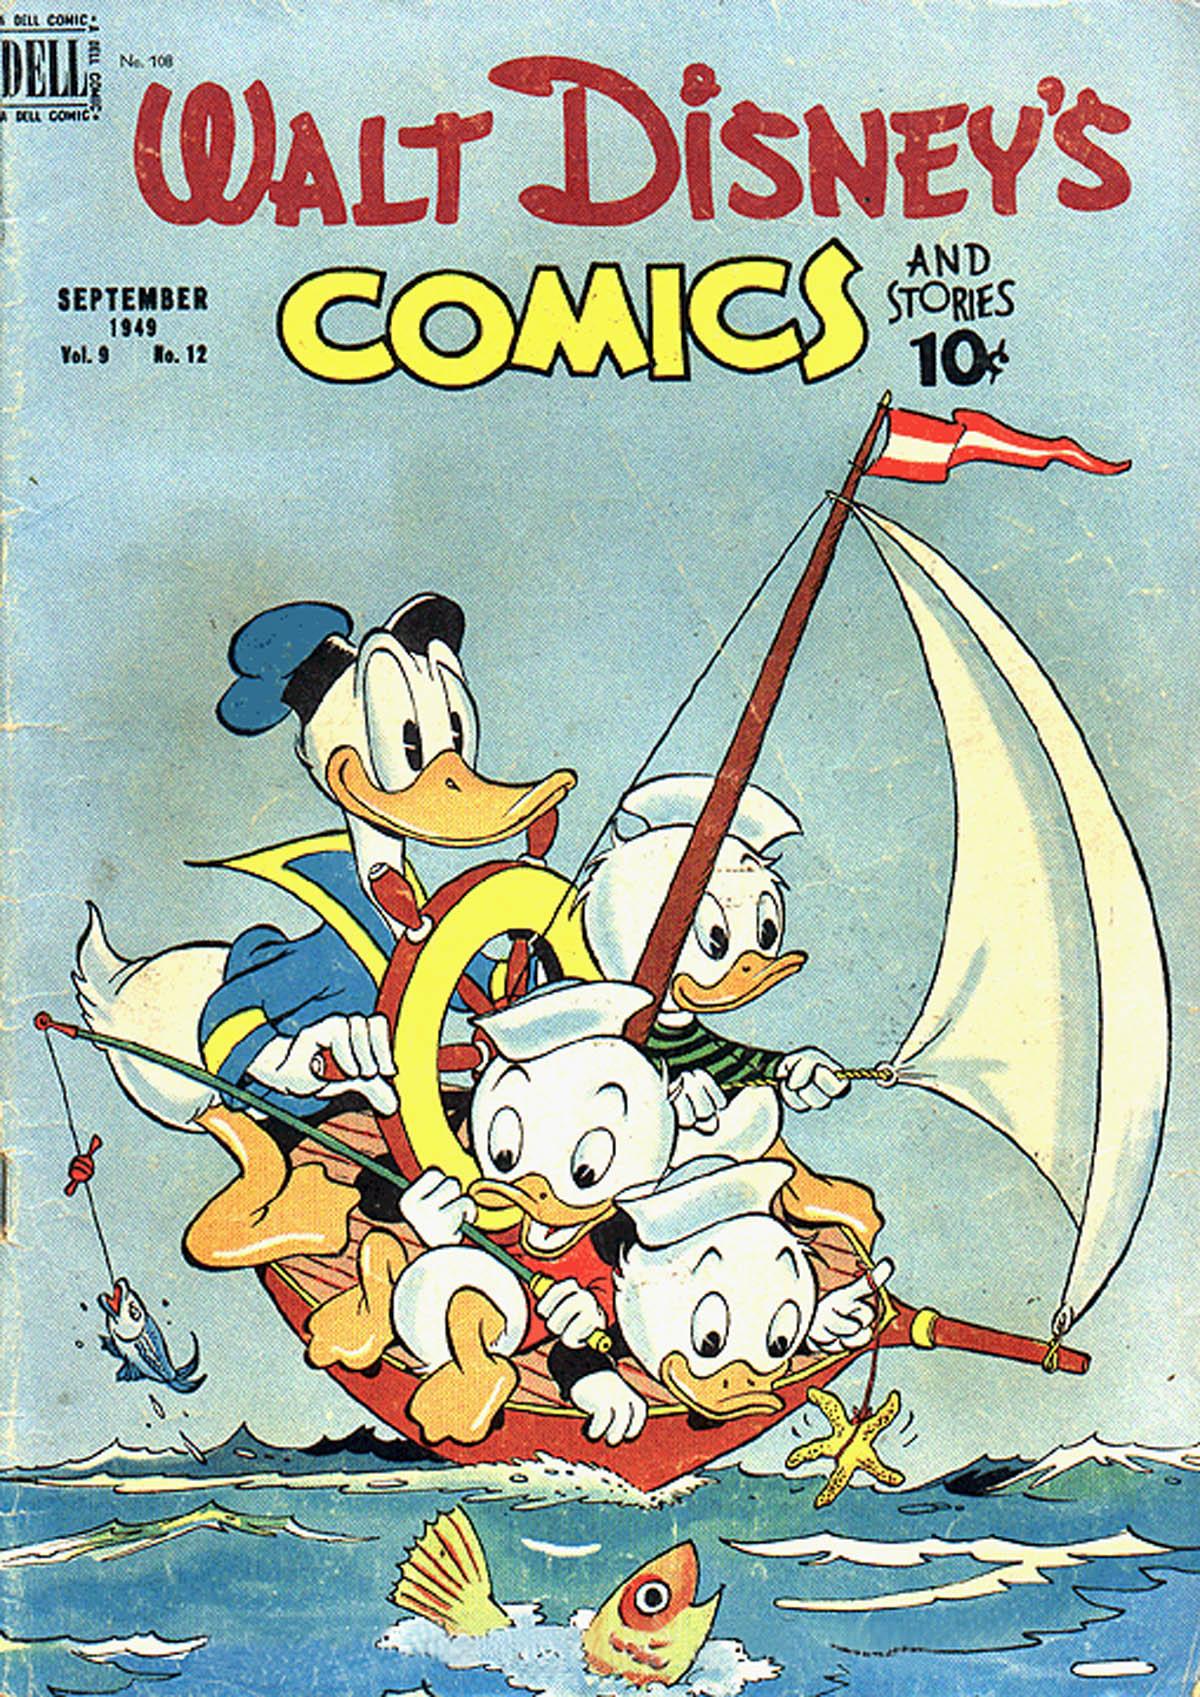 Walt Disneys Comics and Stories 108 Page 1